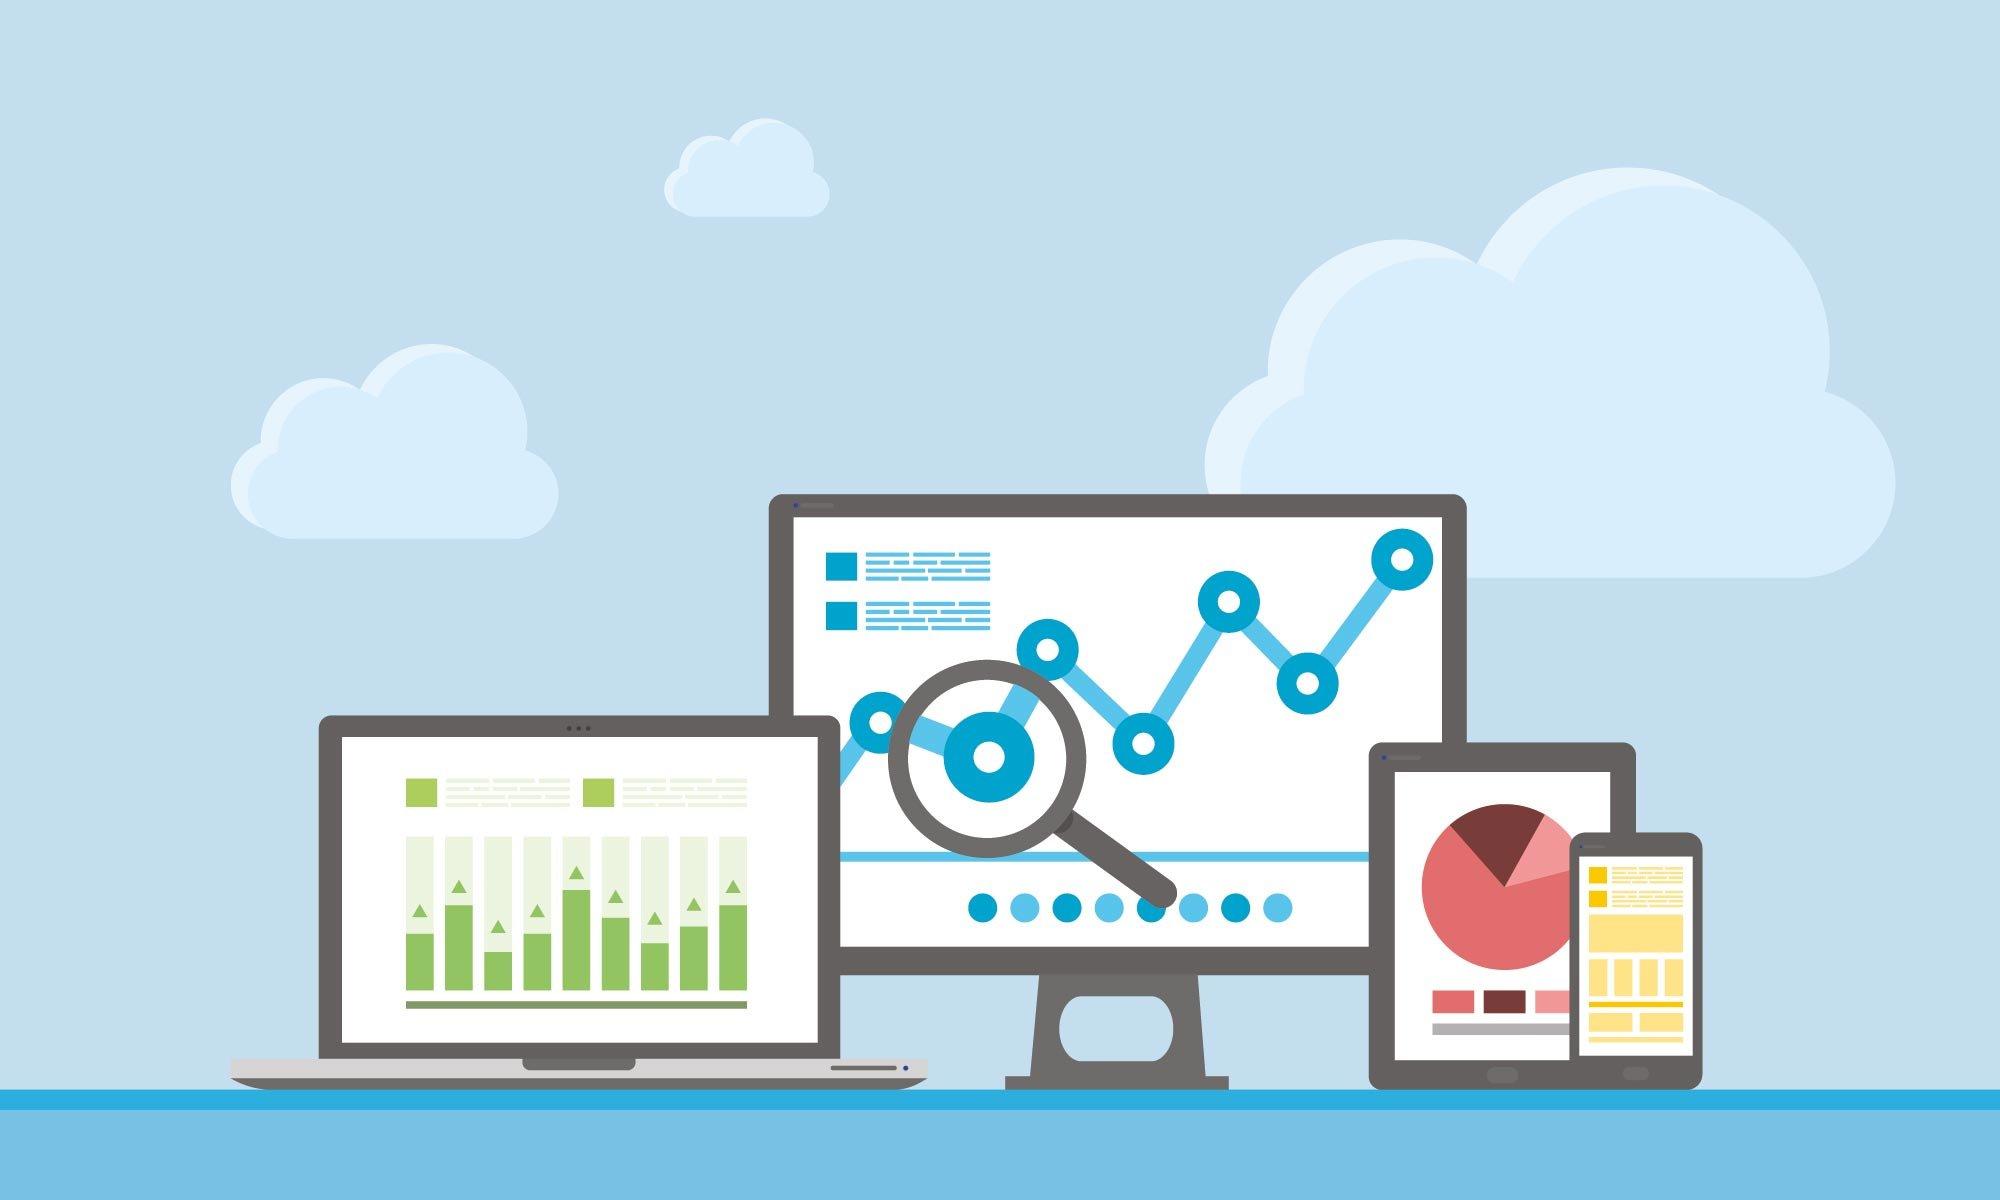 analytics-statistics-cloud-laptop-monitor-tablet-smartphone